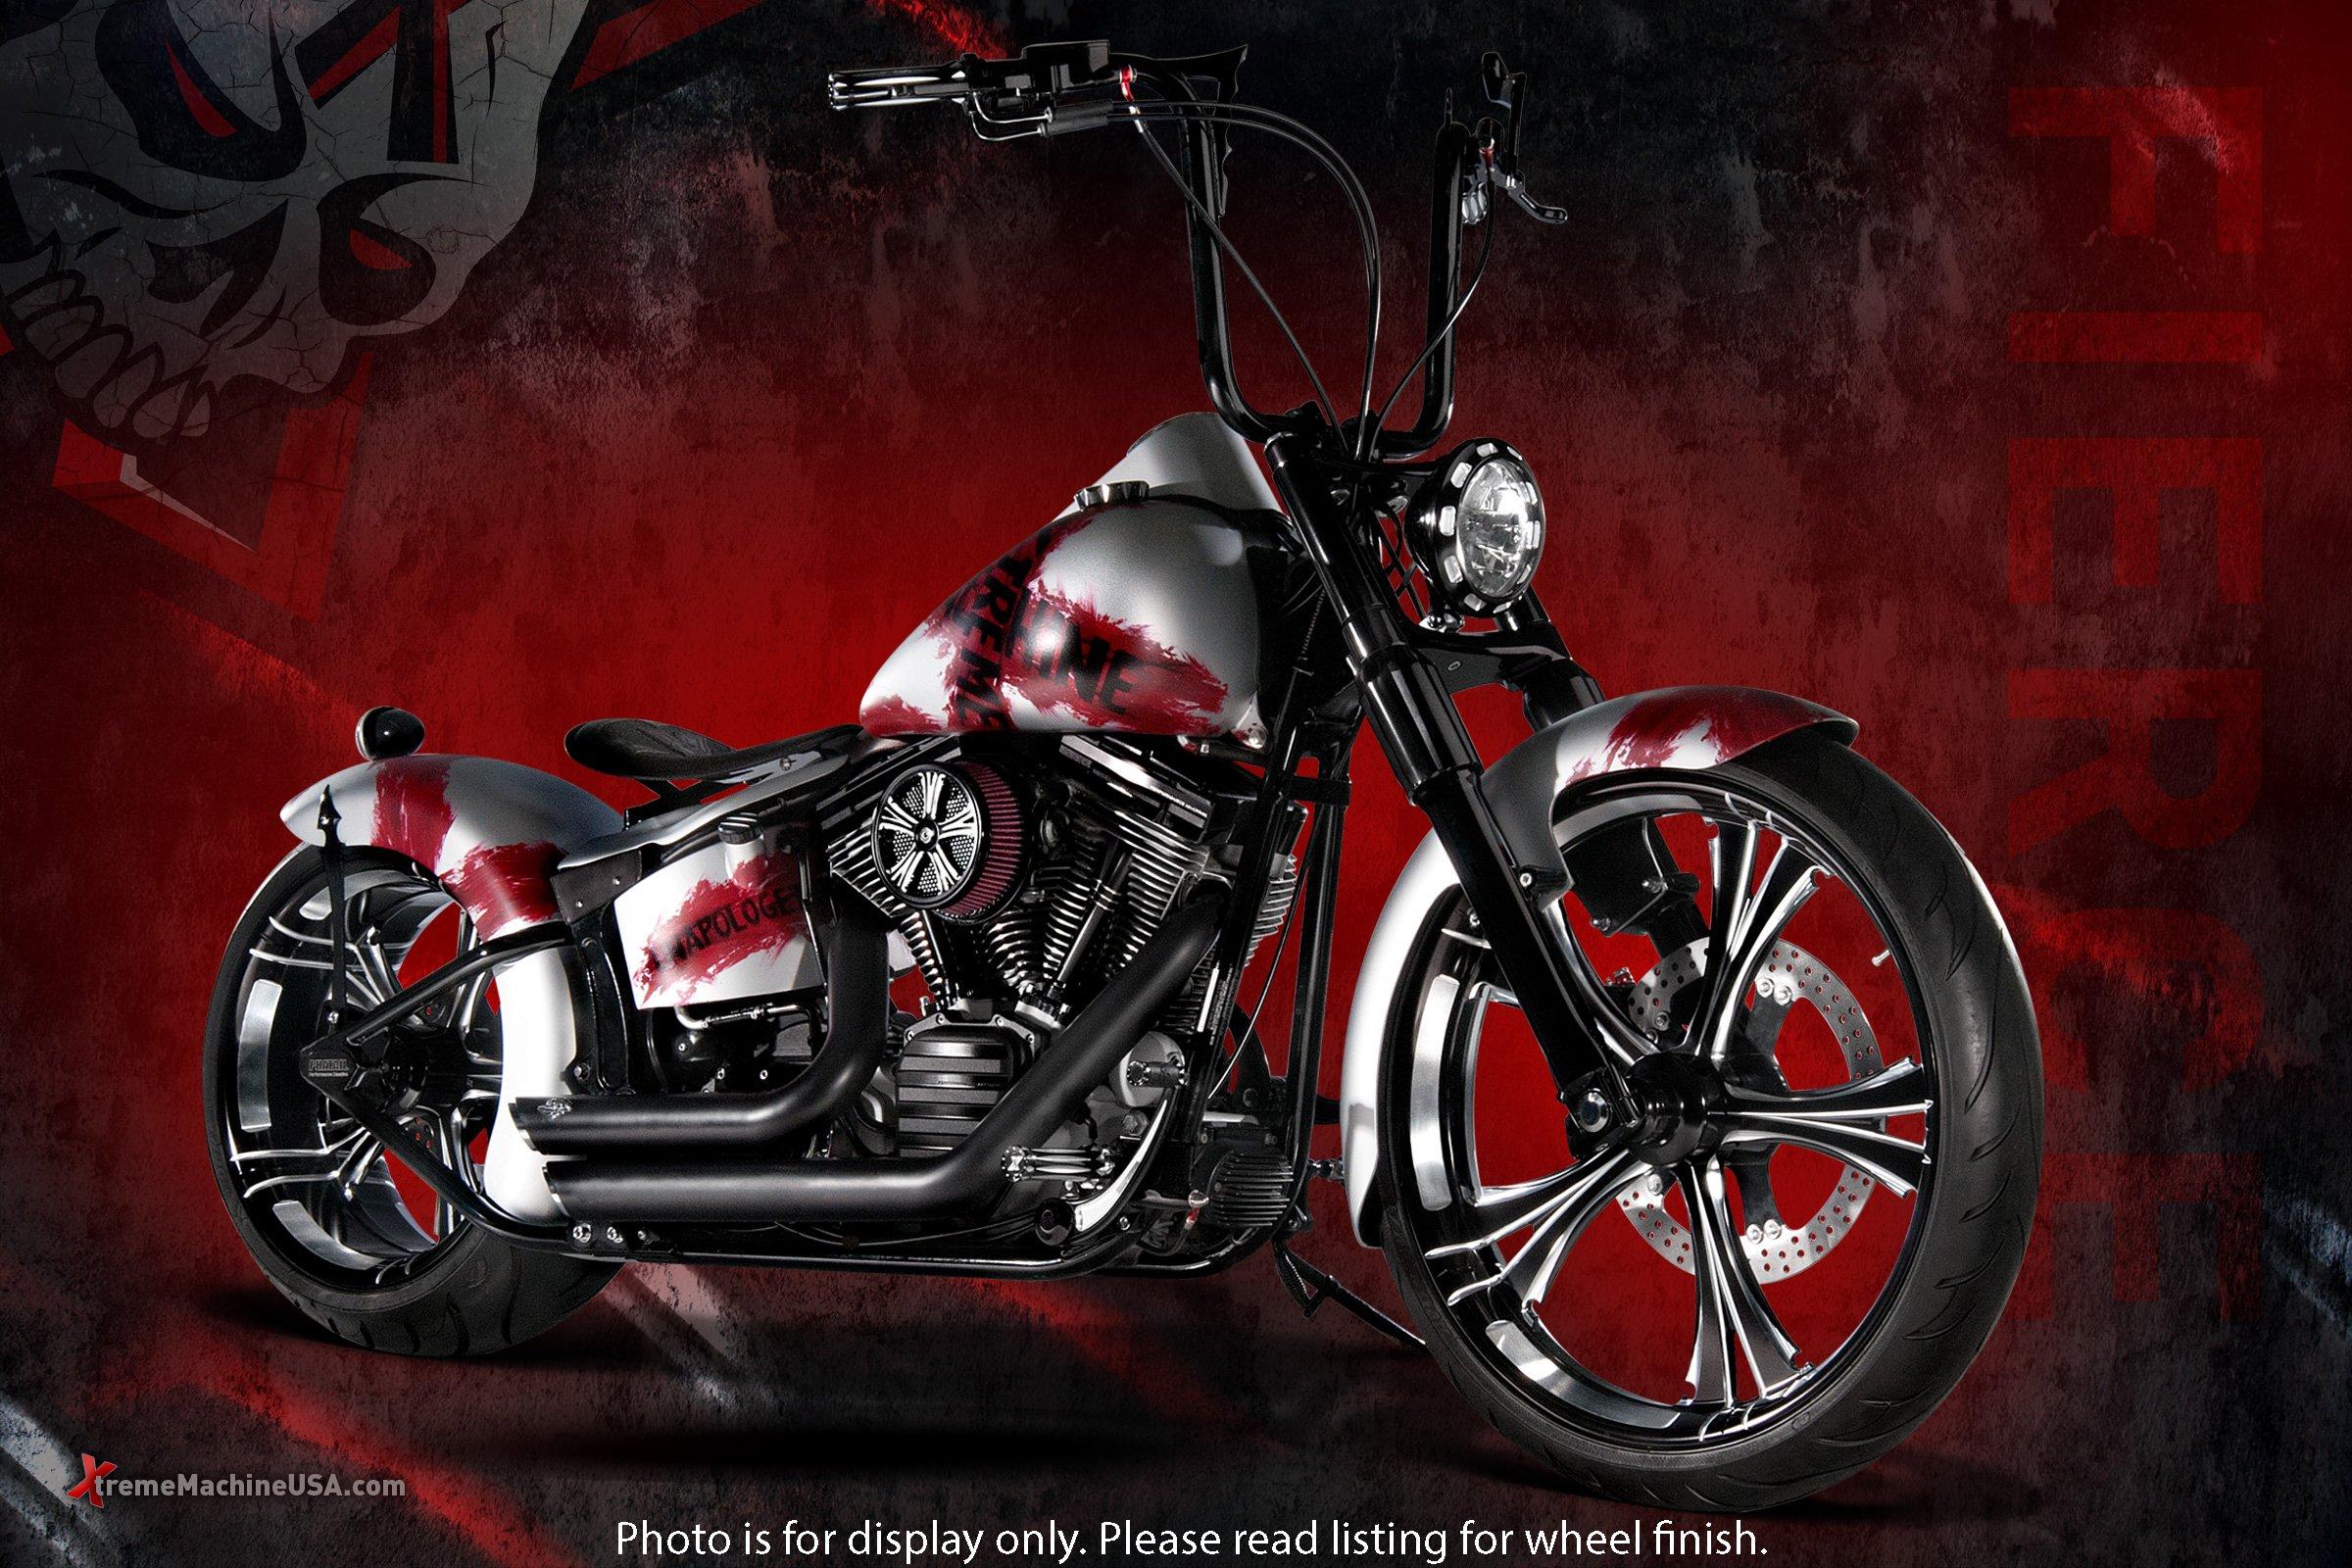 Xtreme Machine Fierce Rear Wheel - 18x5.5 - Black Cut , Color: Black, Position: Rear, Rim Size: 18 1256-7814R-XFR-BM by Xtreme Machine (Image #2)